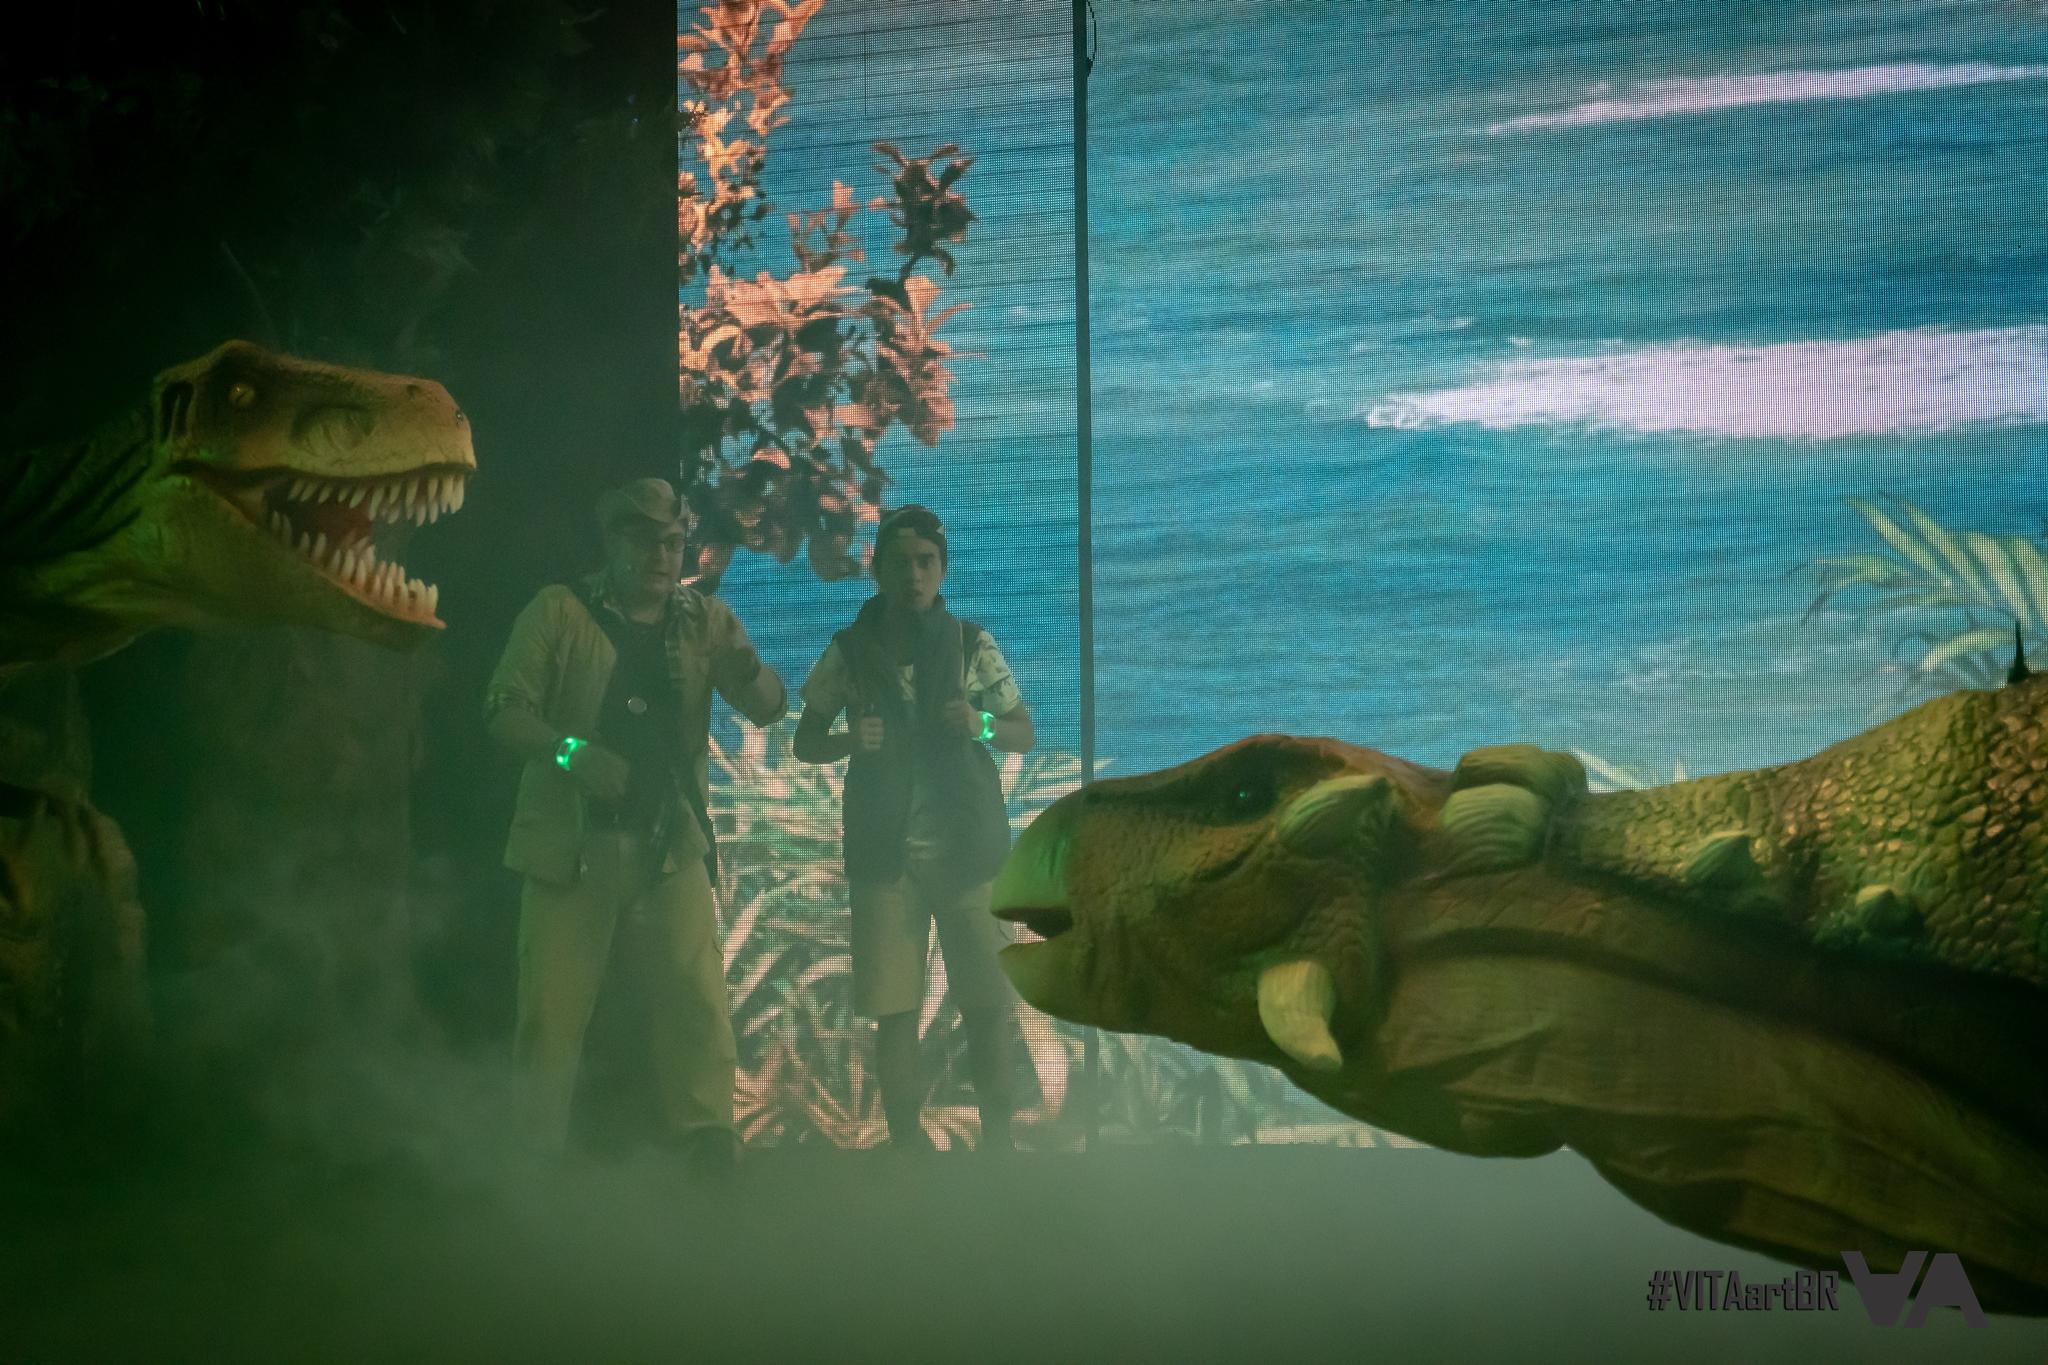 VITAartBR - DinosExperience - 39